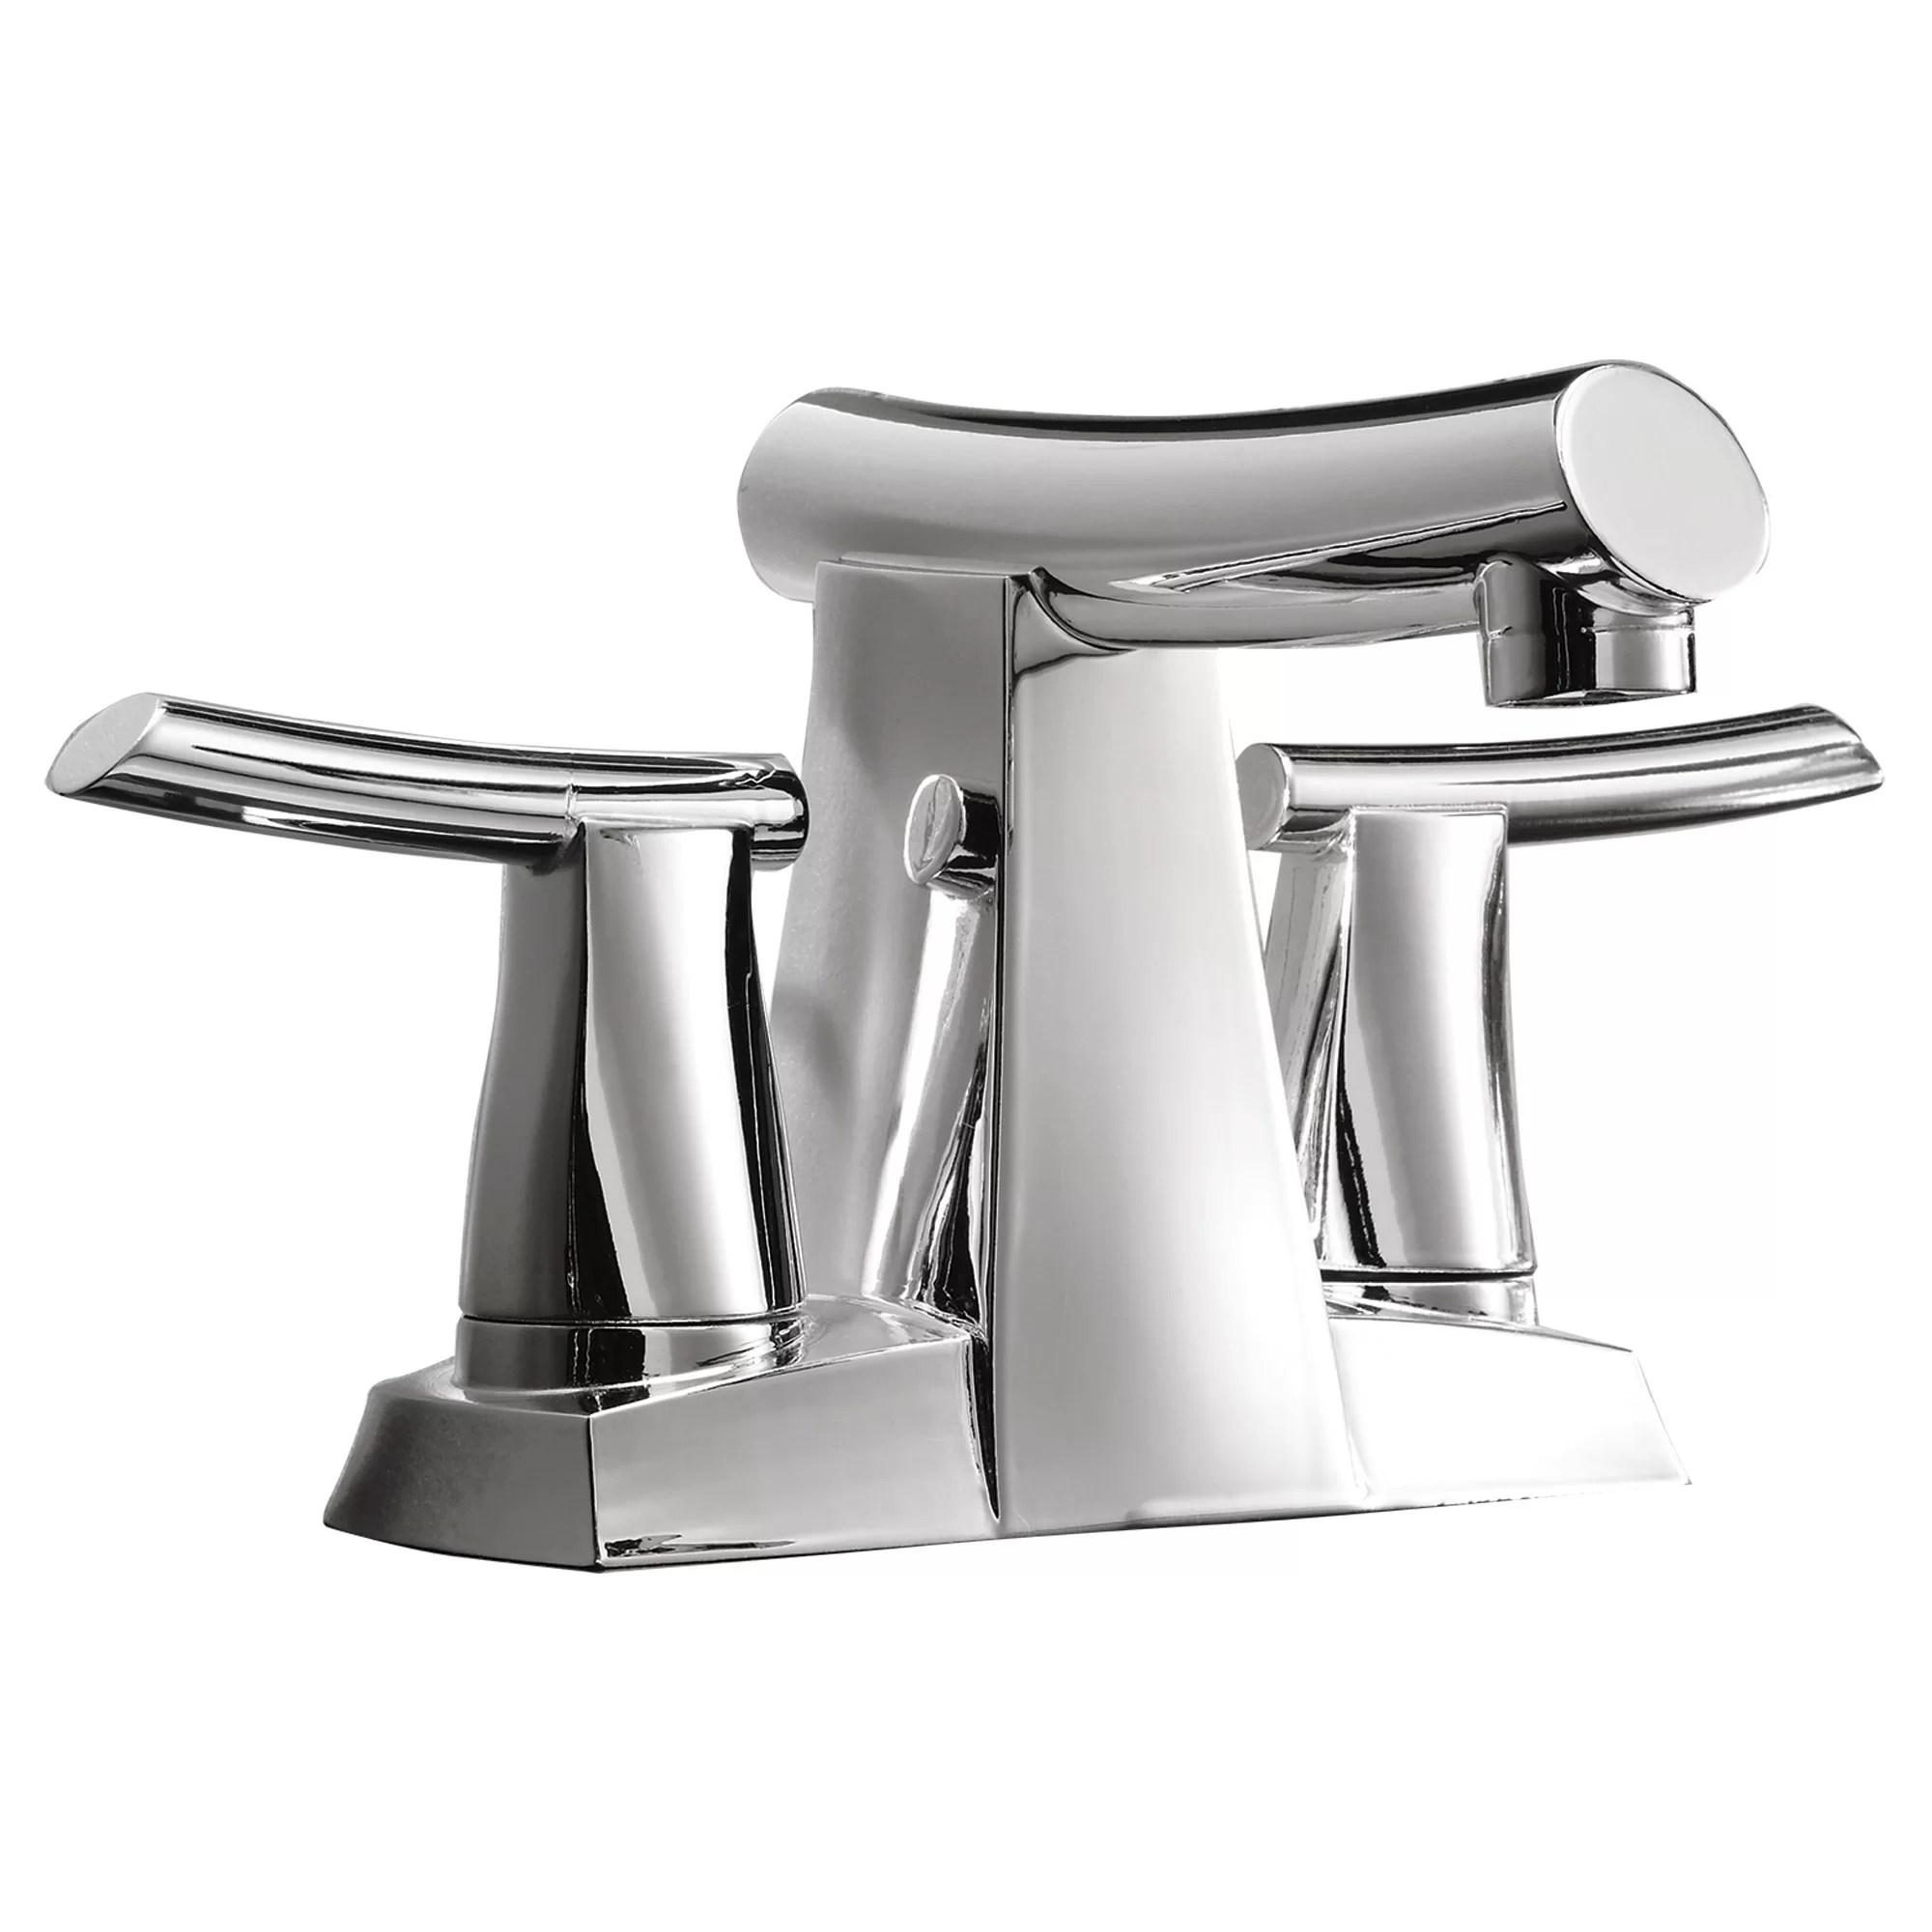 American Standard Green Tea Centerset Bathroom Sink Faucet